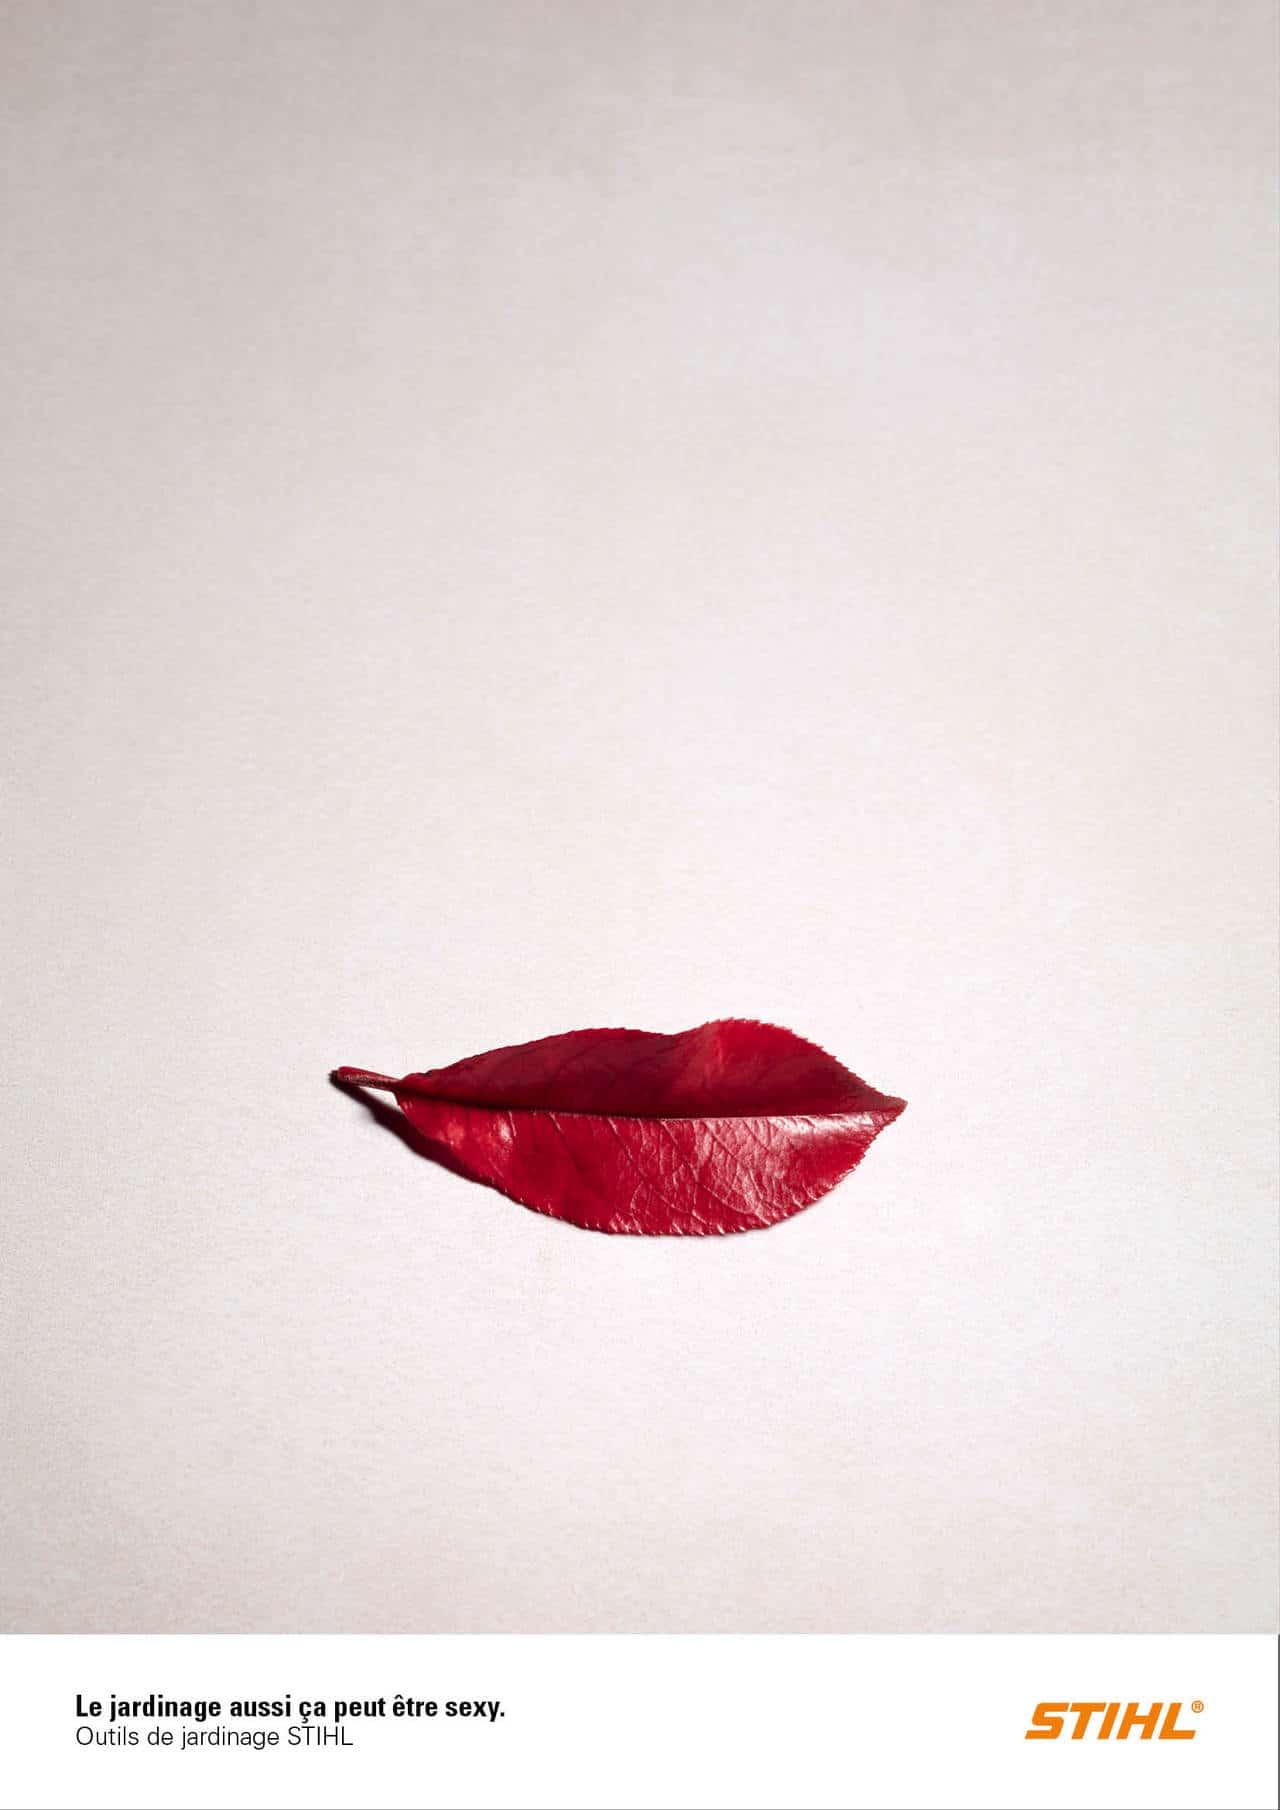 Pub STIHL Lips